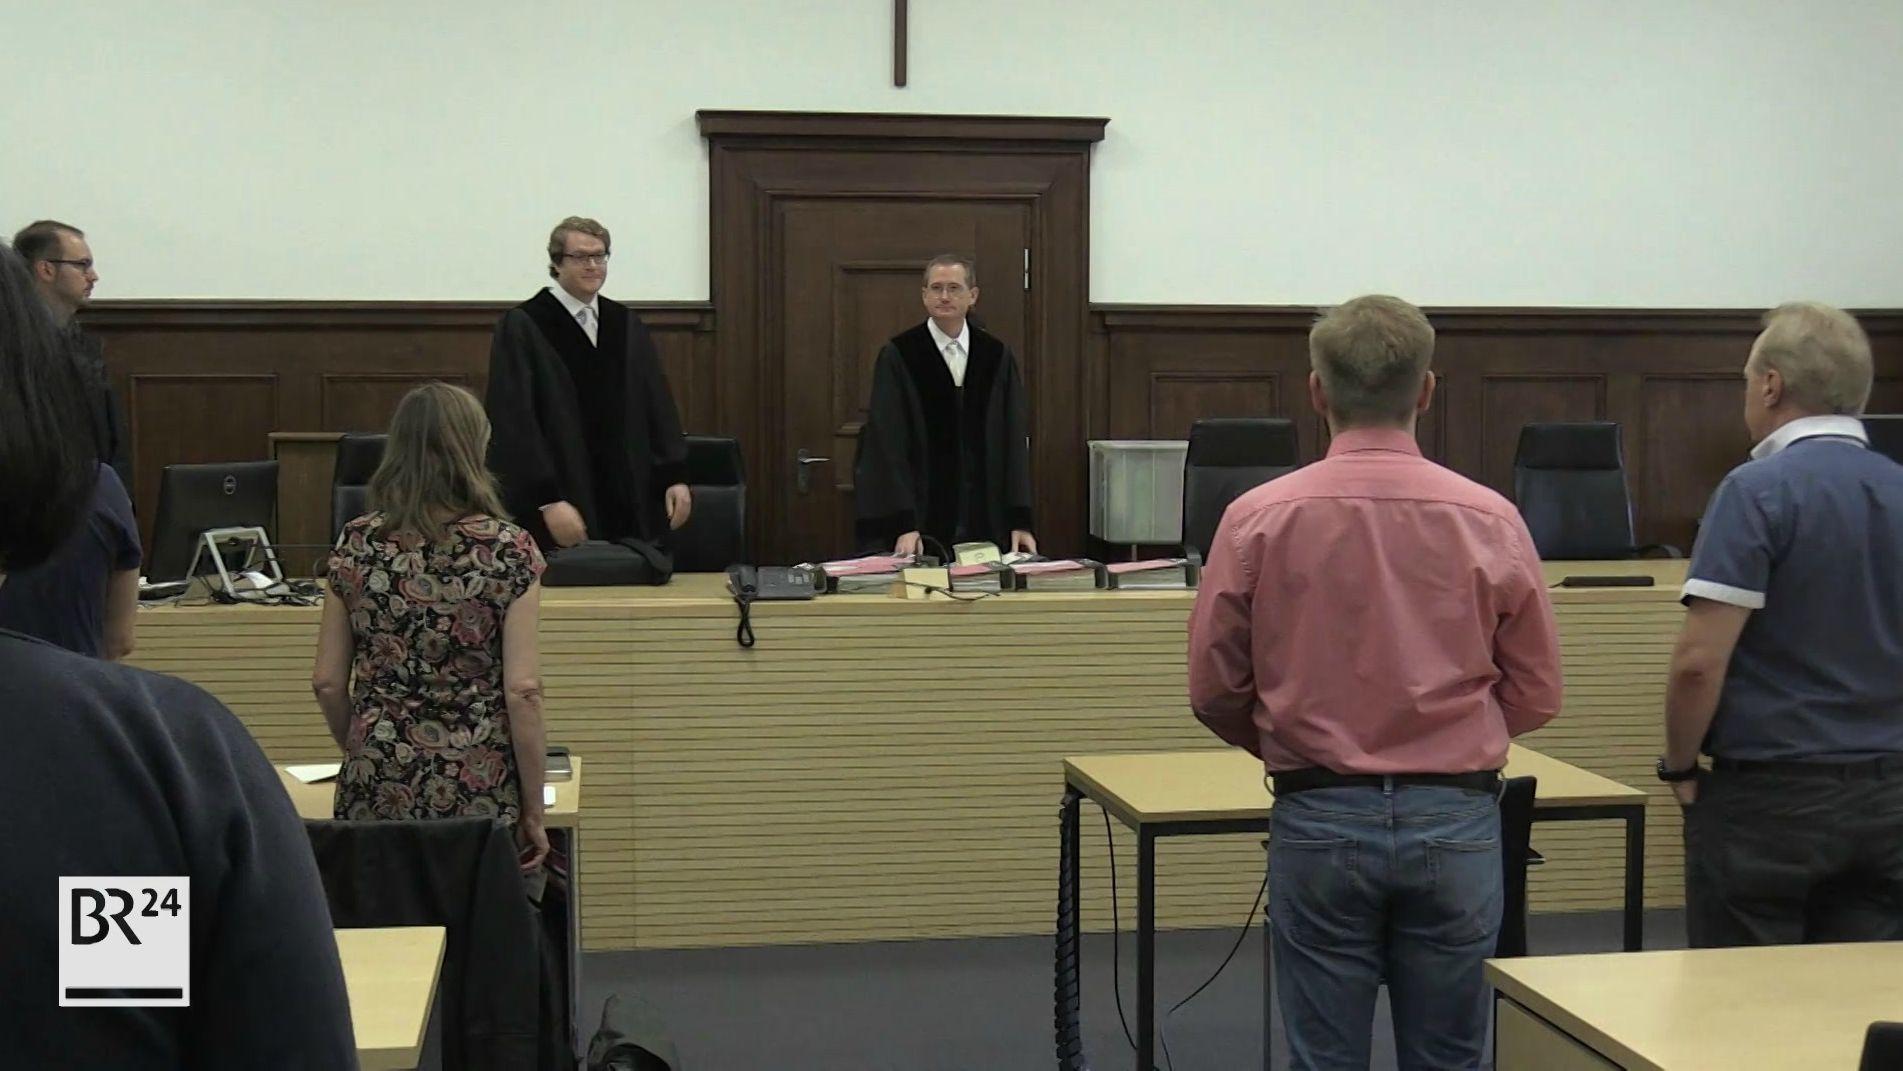 Prozessbeginn wegen 130 Kilogramm Marihuana in Nürnberg.